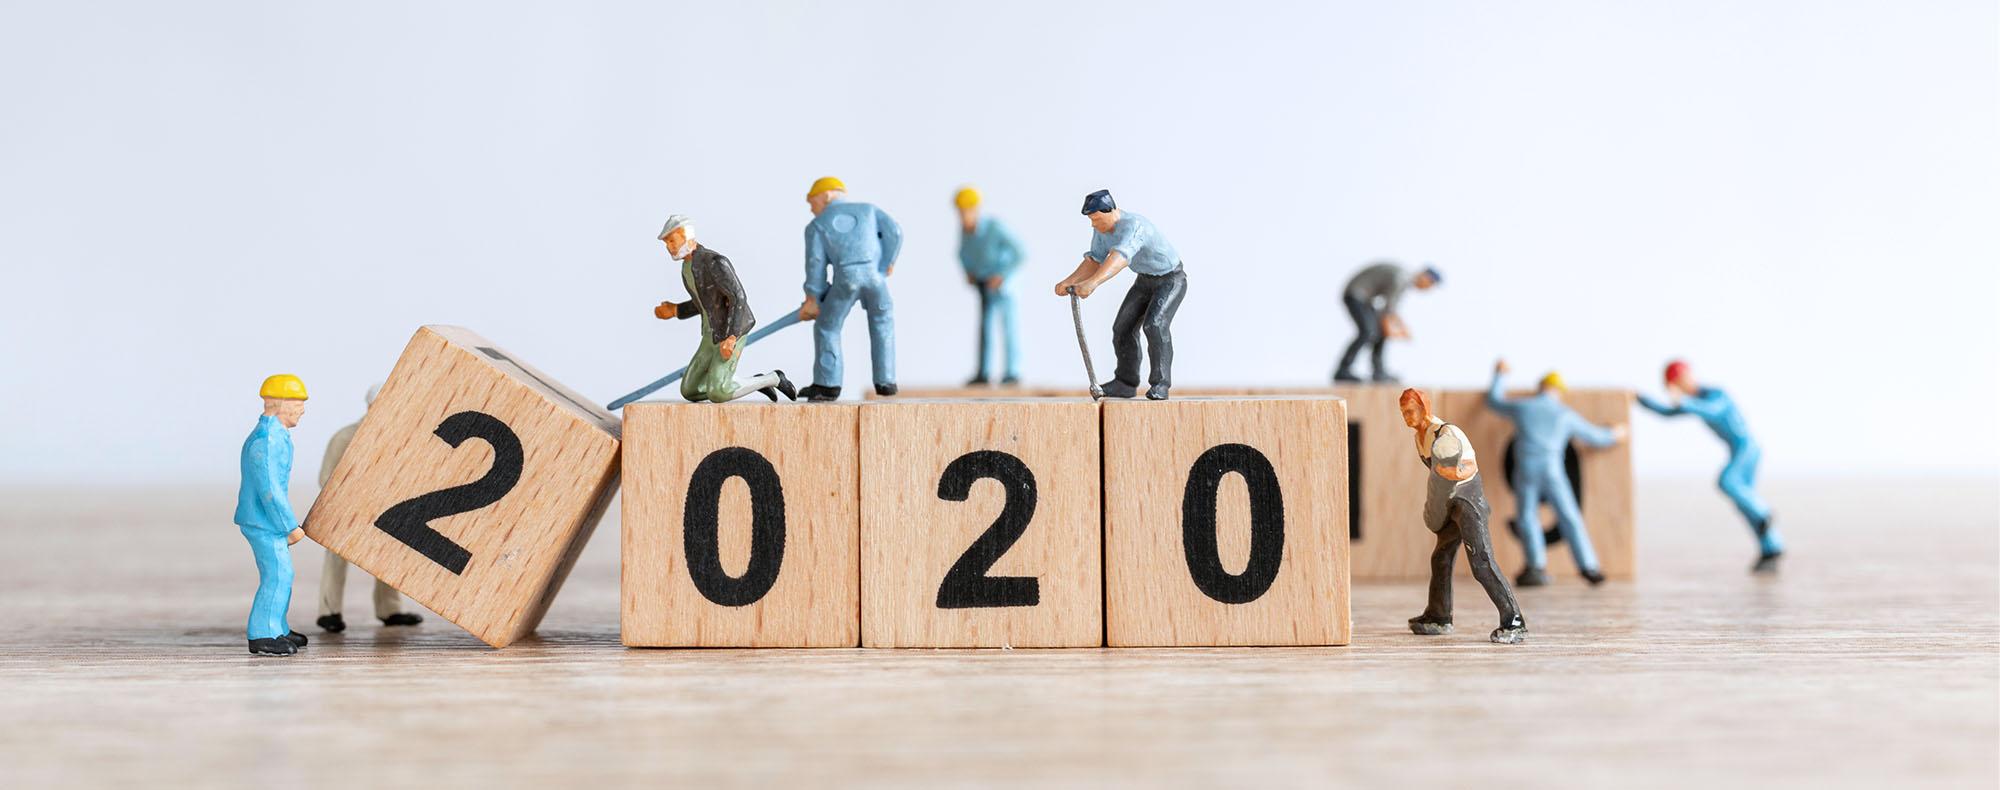 GENJOT 2020